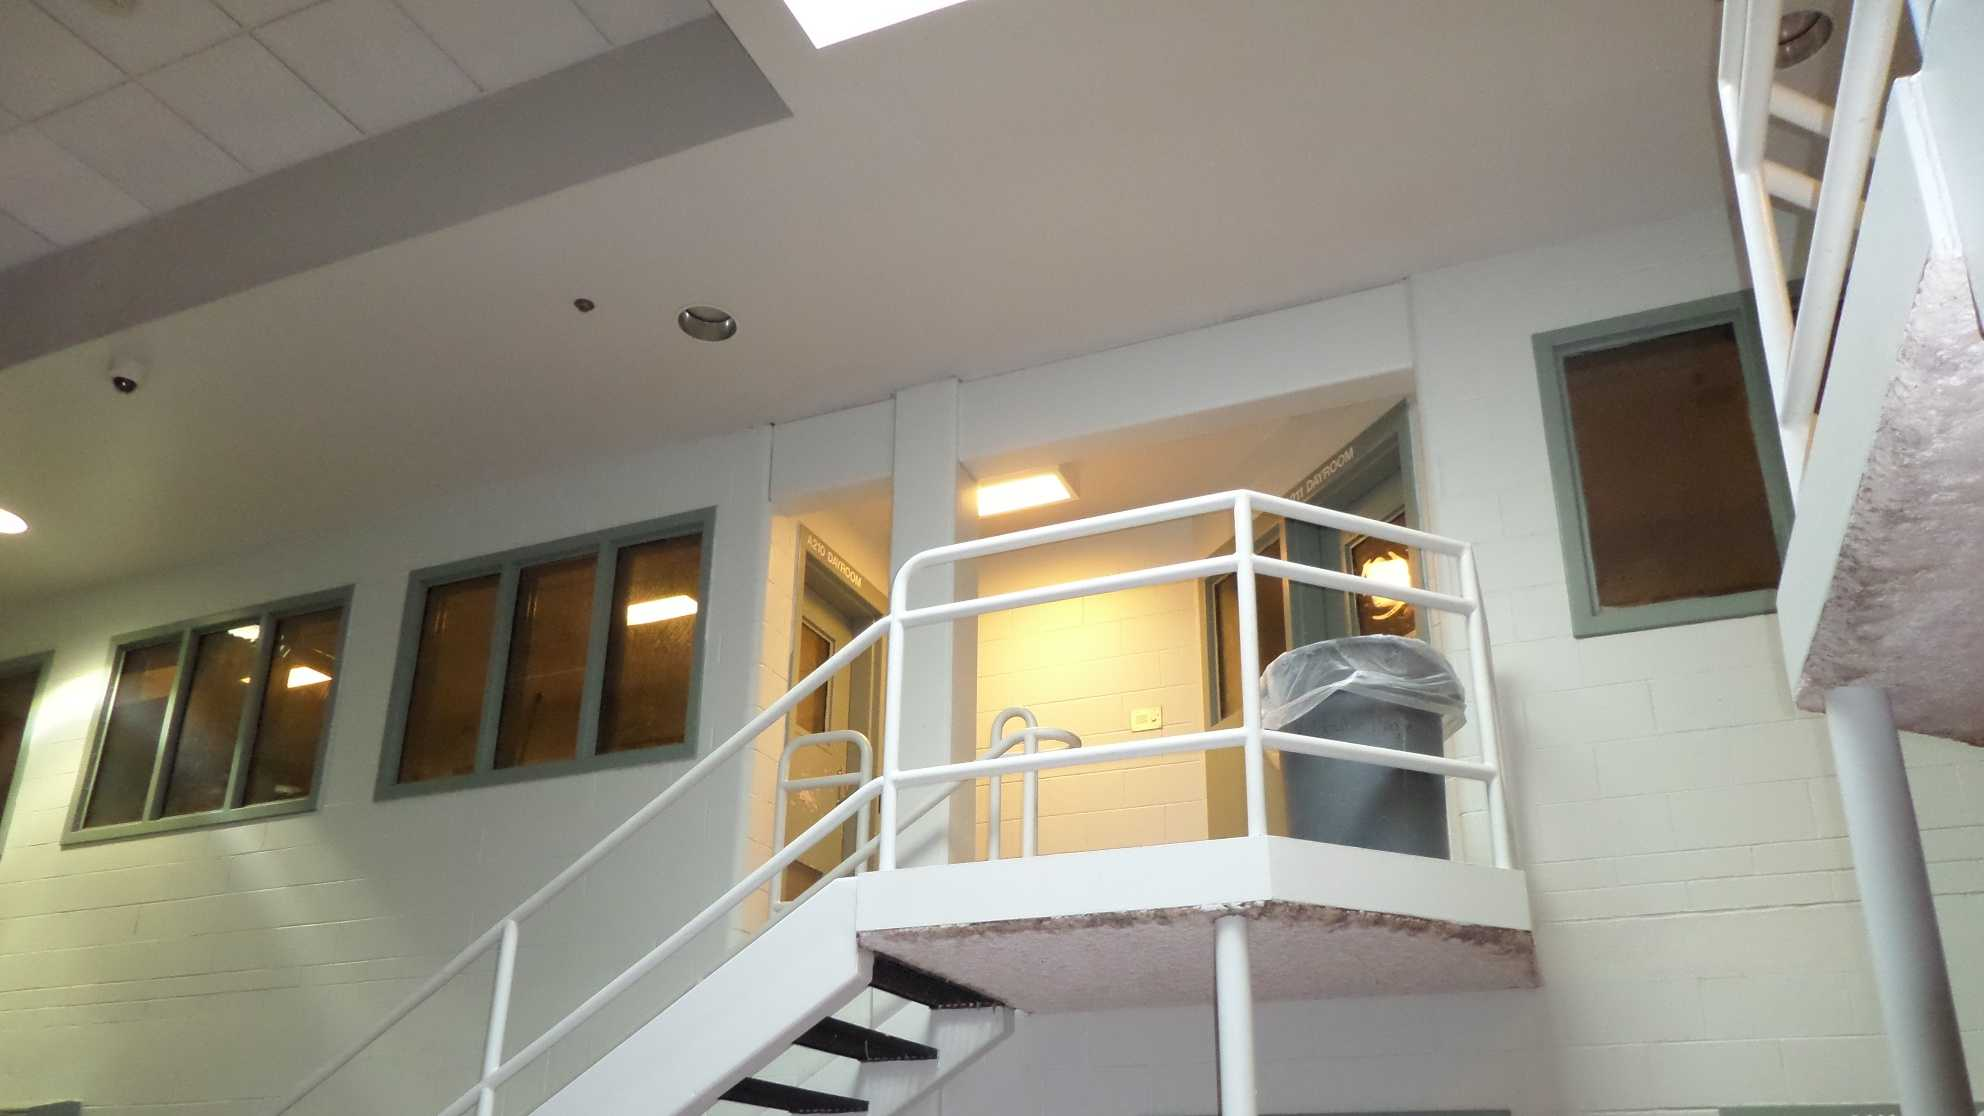 Cumberland County Jail Inside.JPG